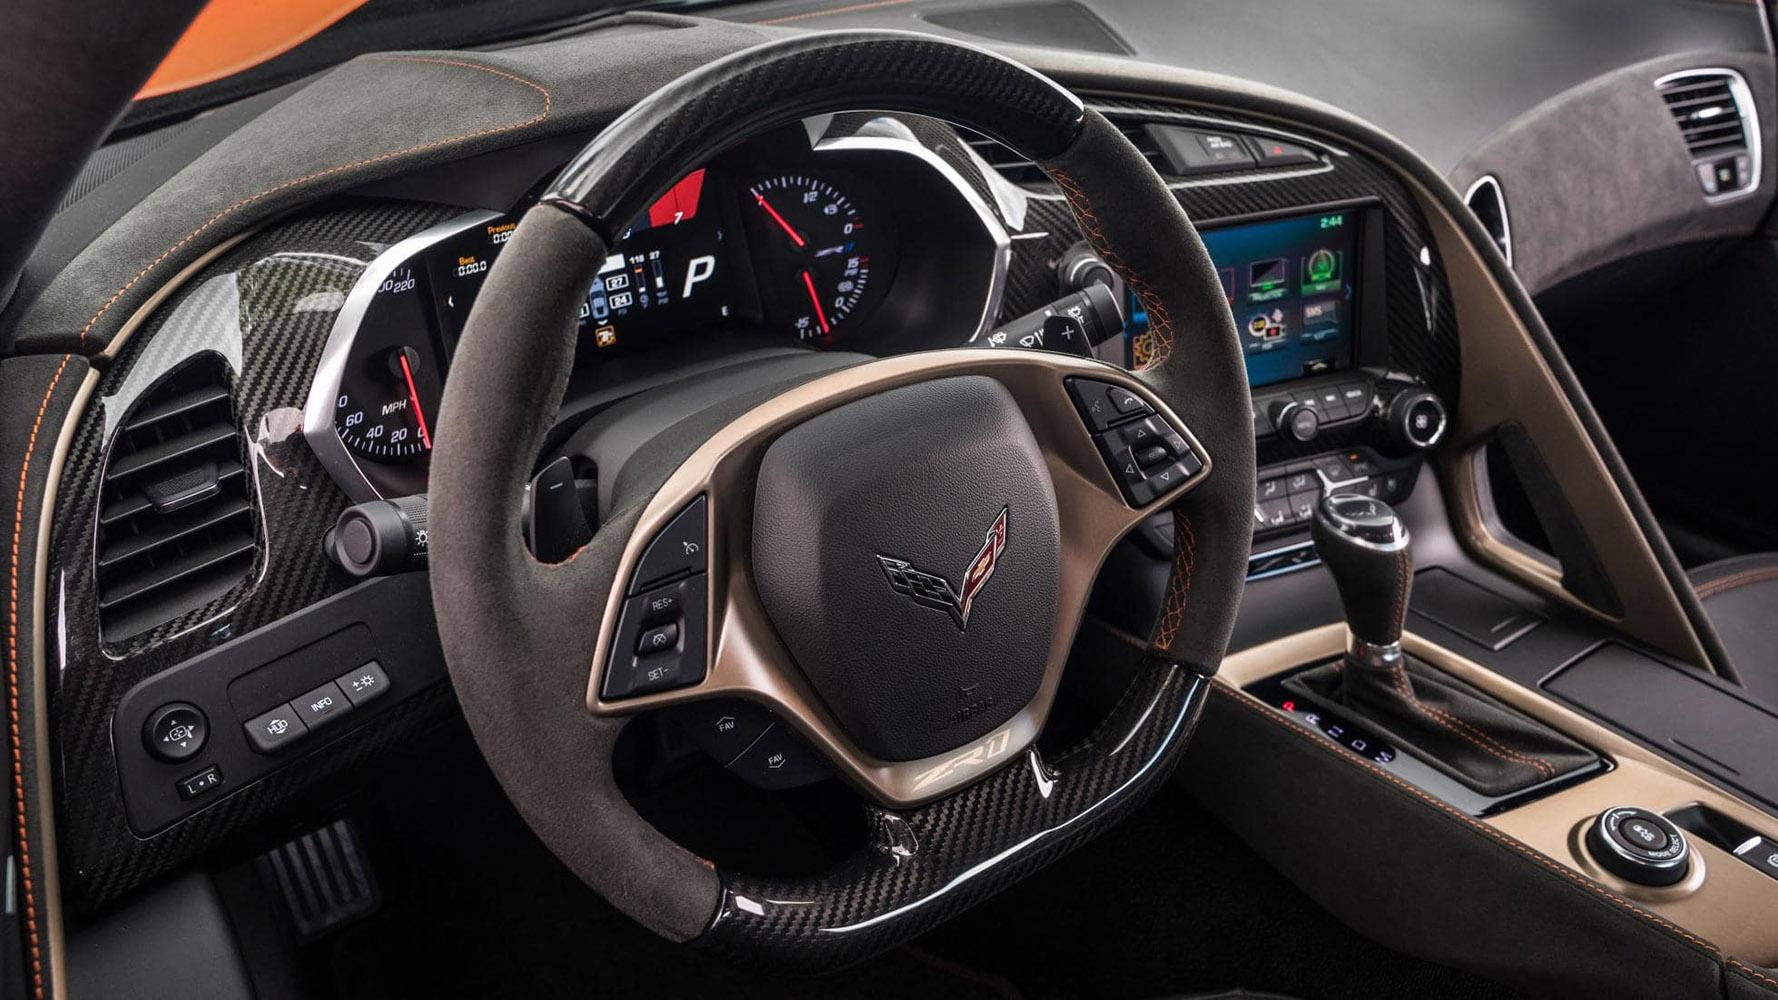 TopGear   Chevrolet Corvette ZR1 review: ultimate C7 'Vette